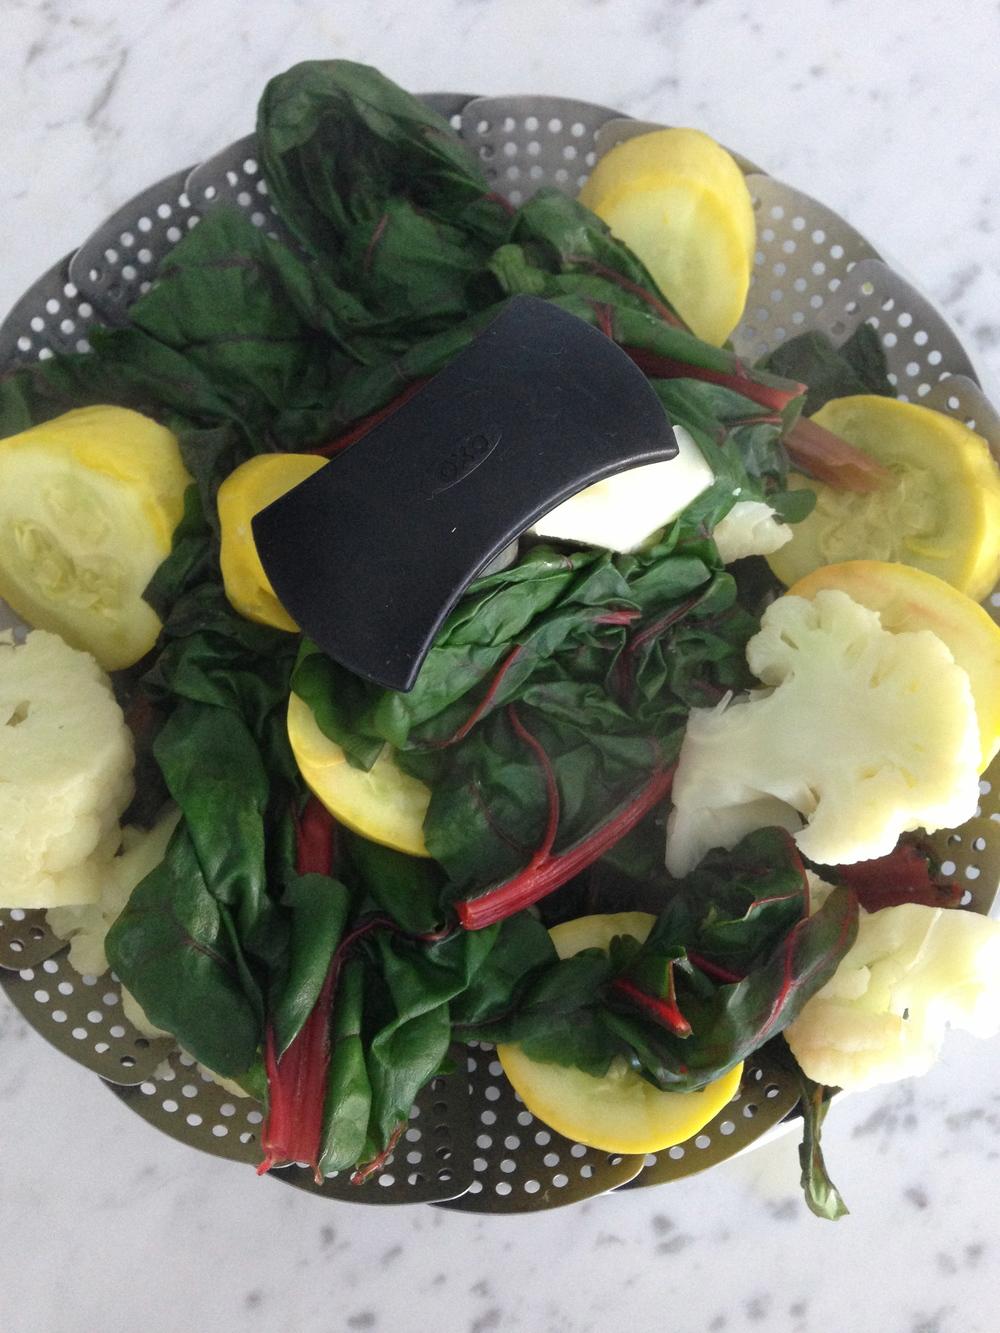 Steamed chard, cauliflower, and squash.